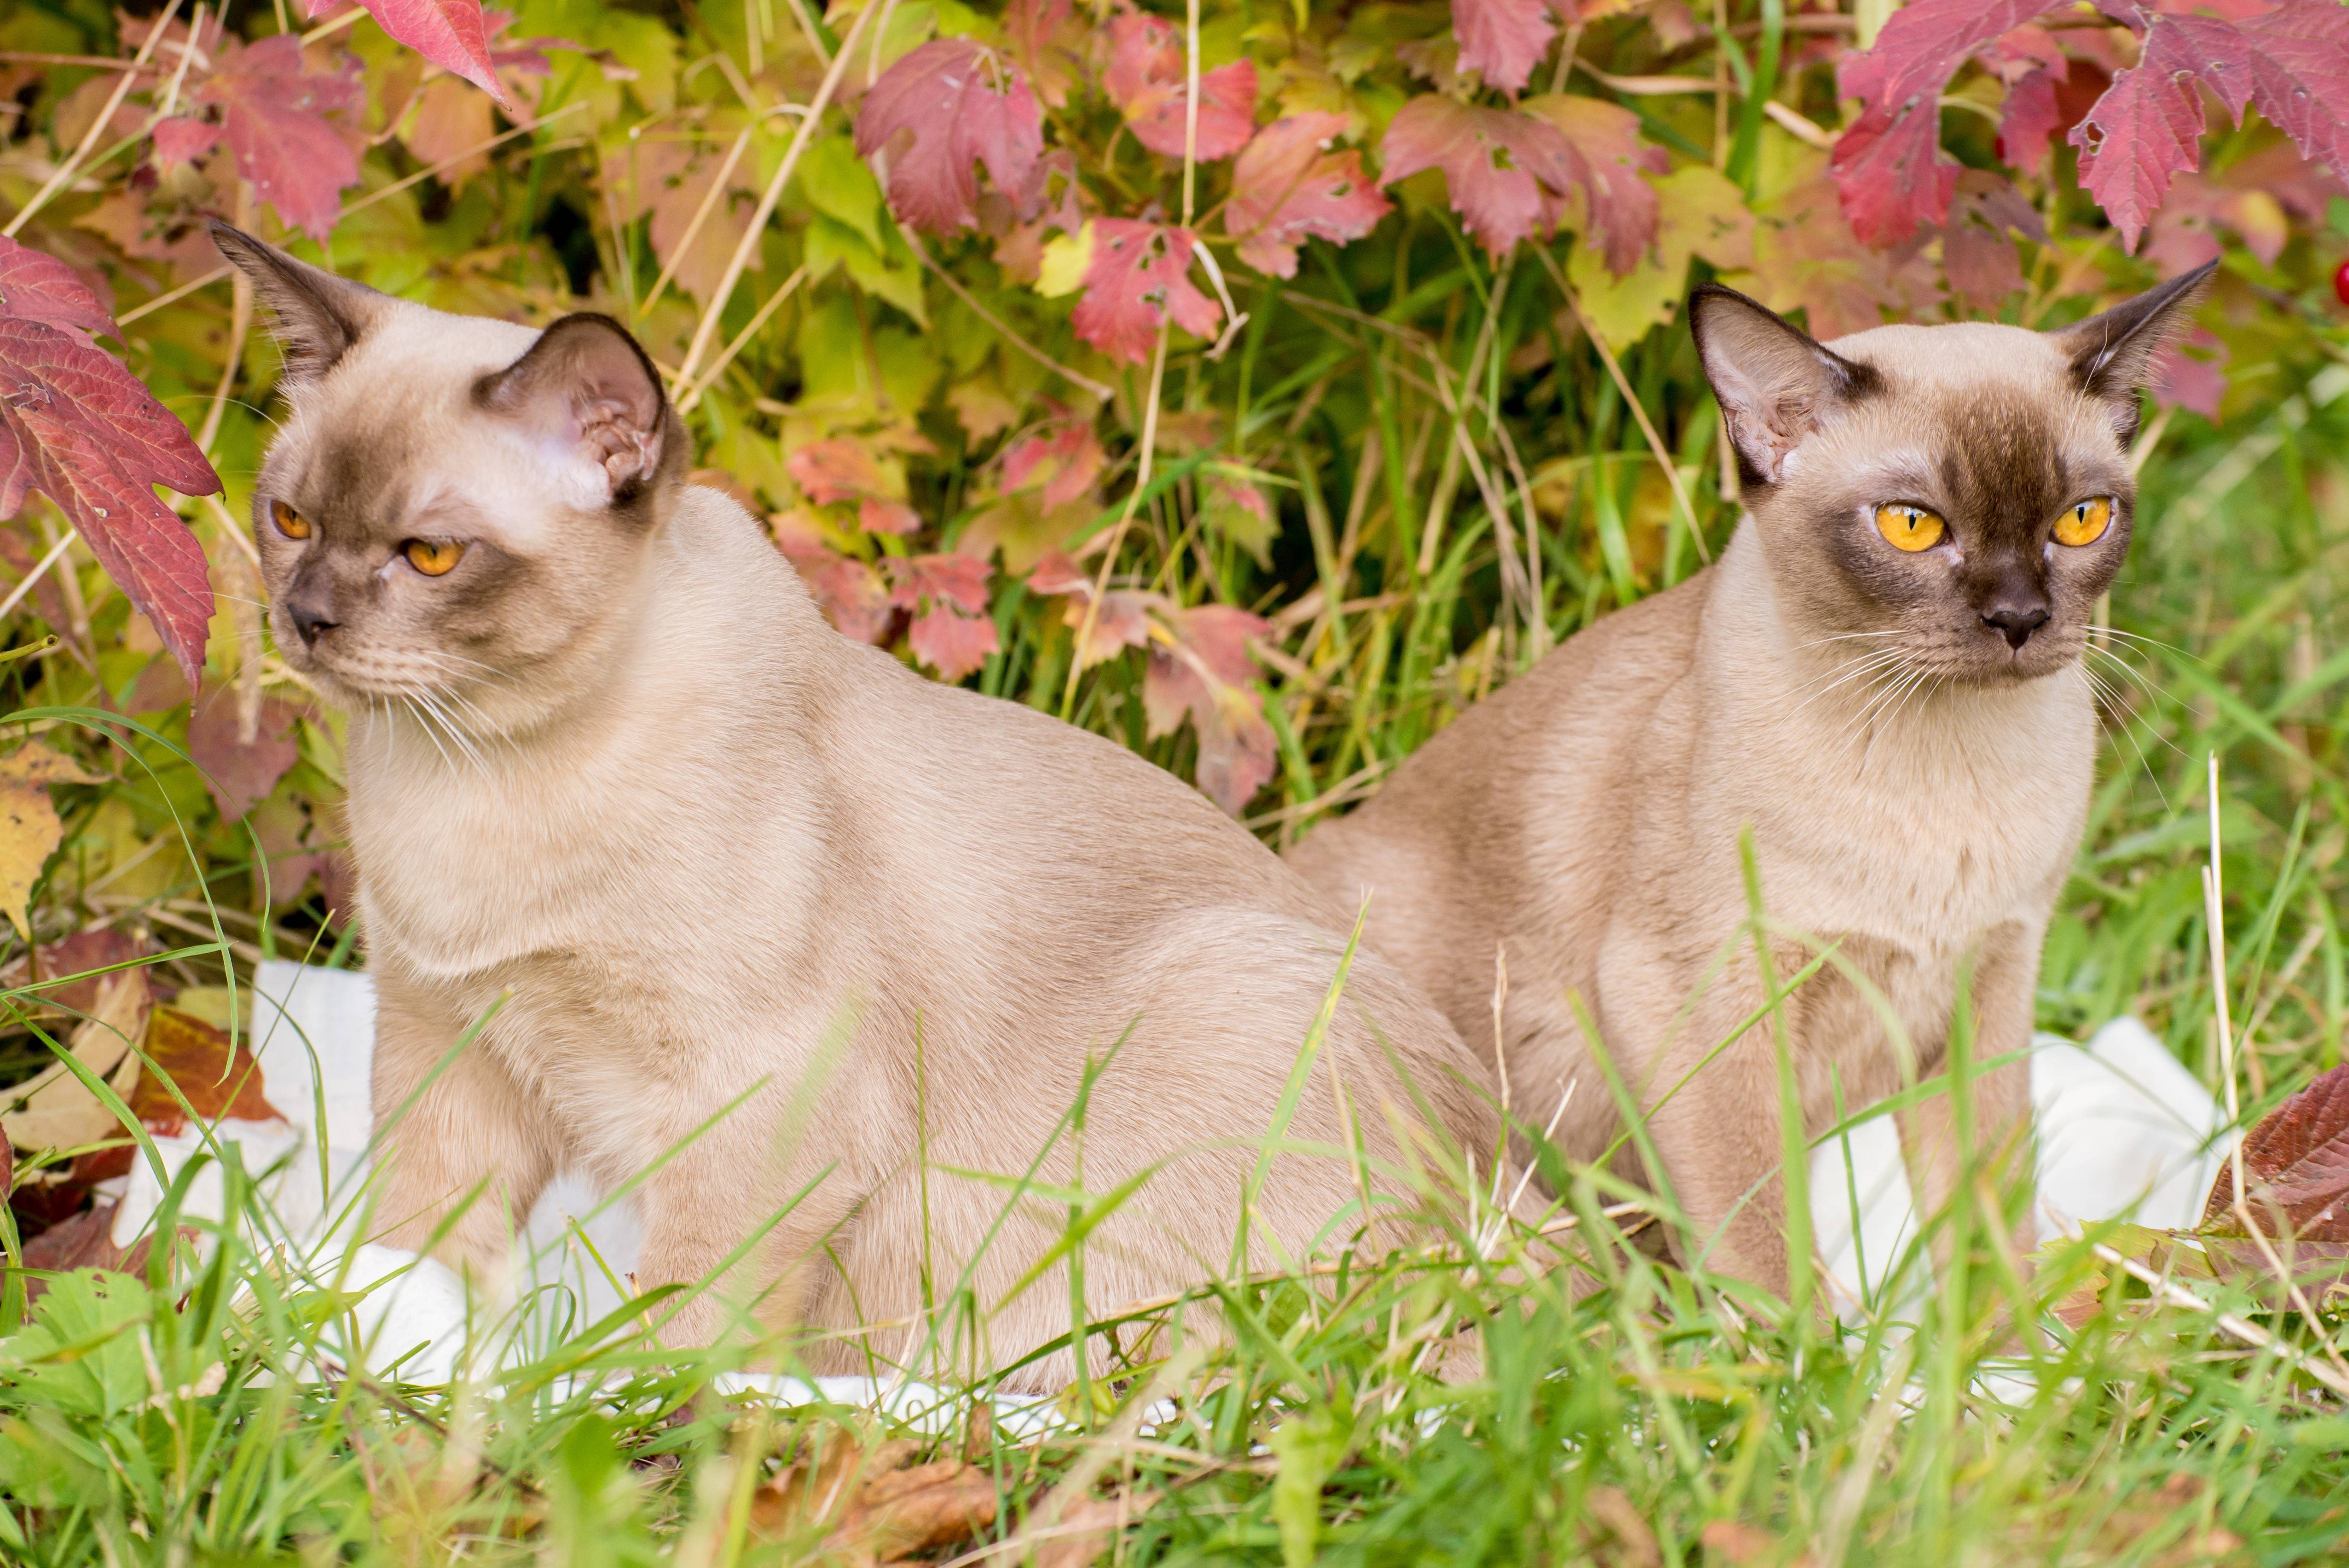 Бурмилла кошка. описание, особенности, уход и цена бурмиллы | животный мир